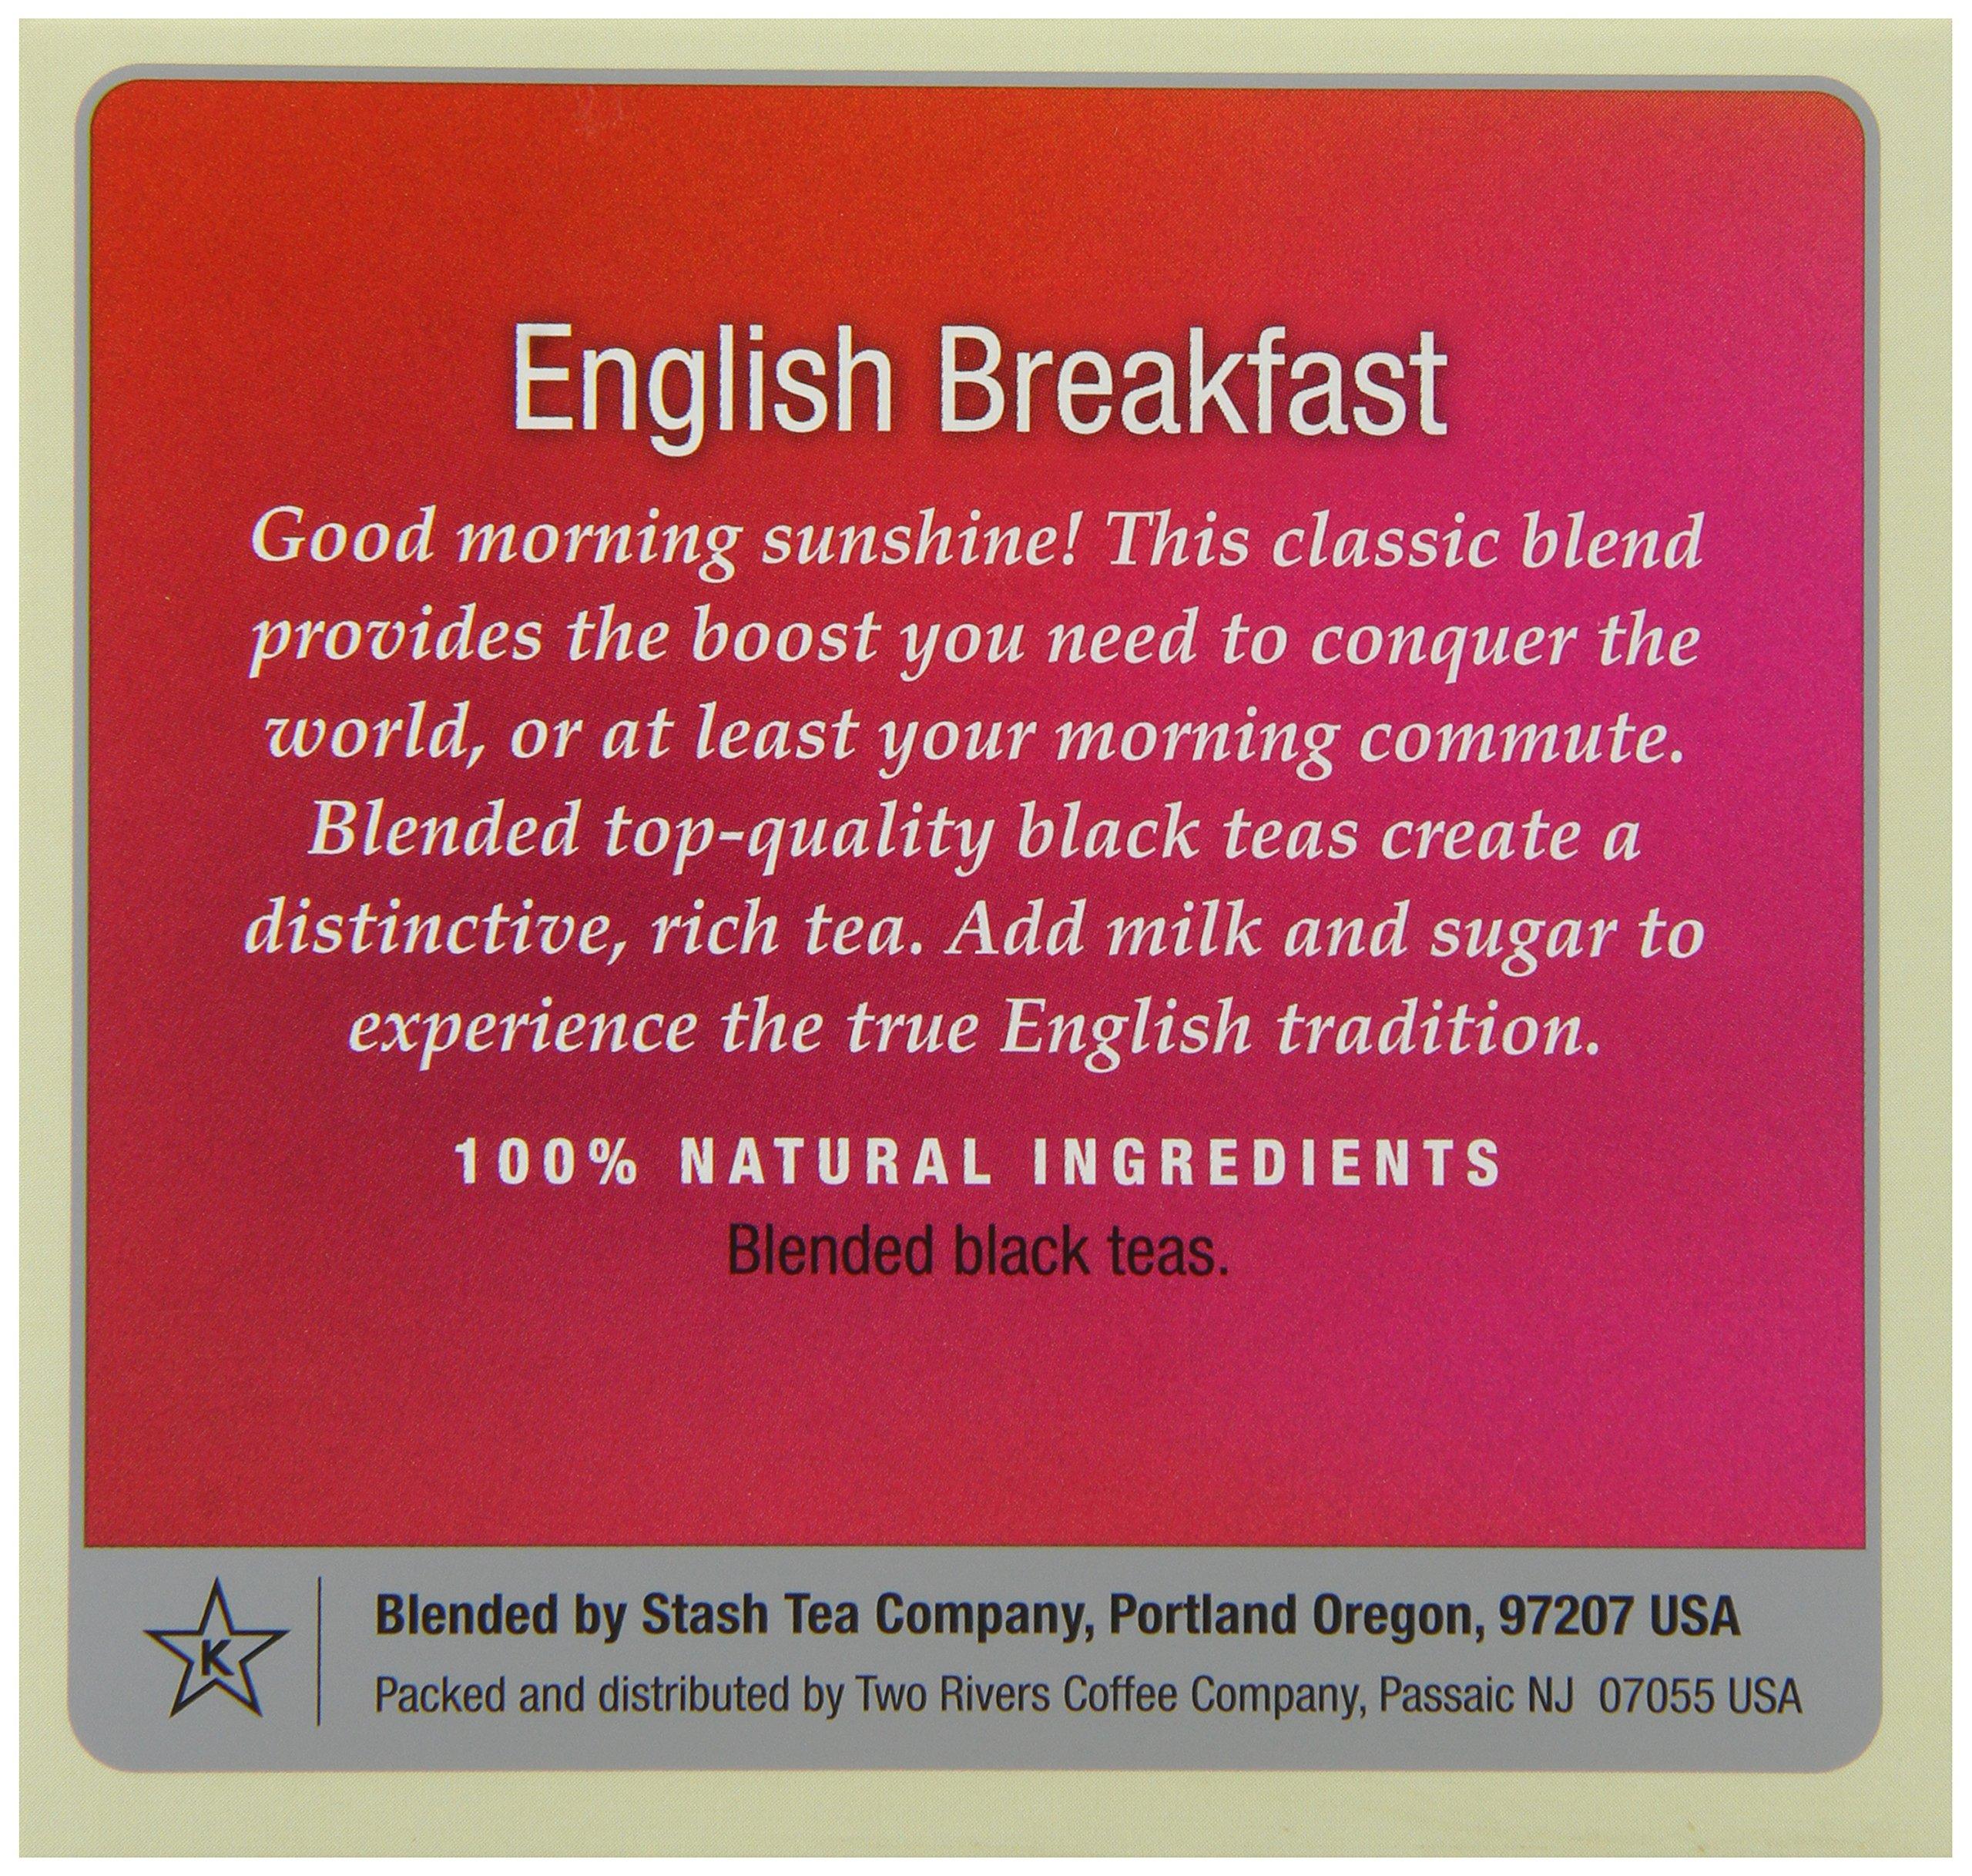 Stash Tea English Breakfast Single-Cup Tea for Keurig K-Cup Brewers, 12 Count (Pack of 6)